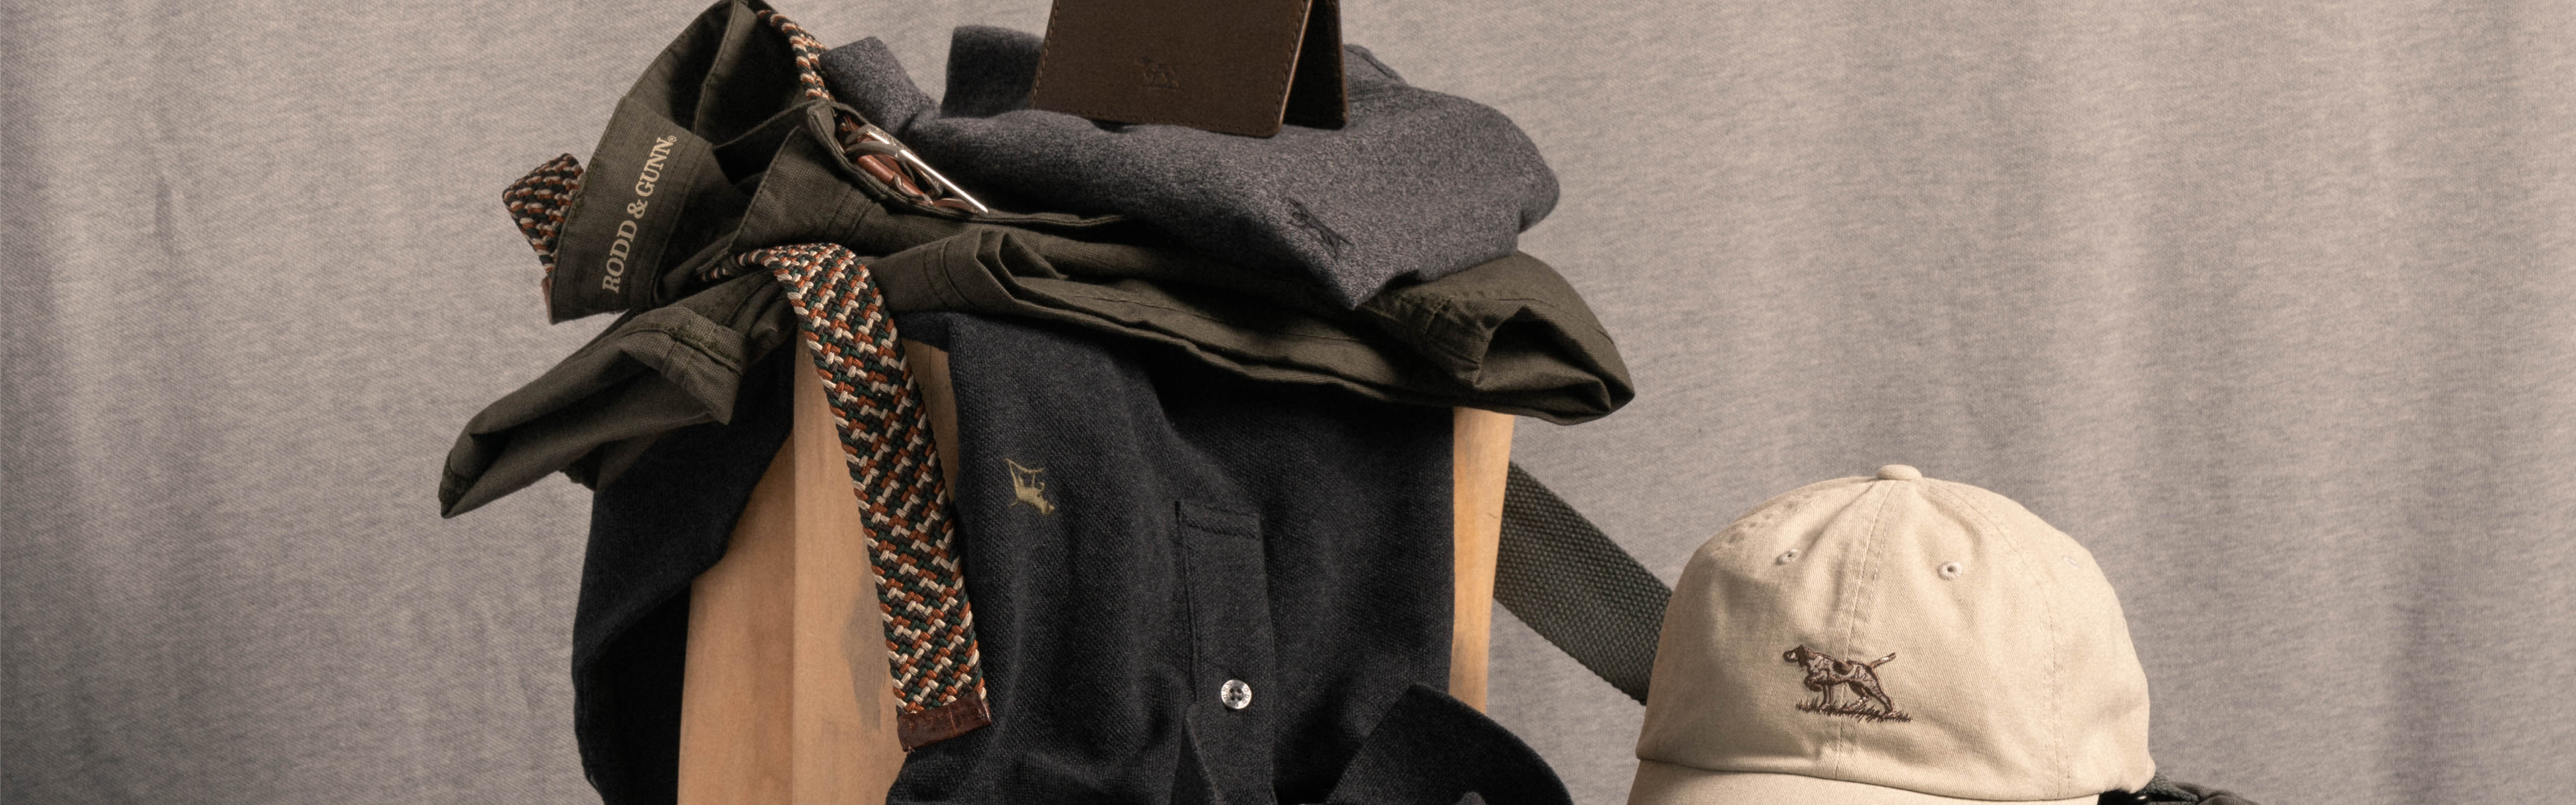 Clothing Gift Ideas